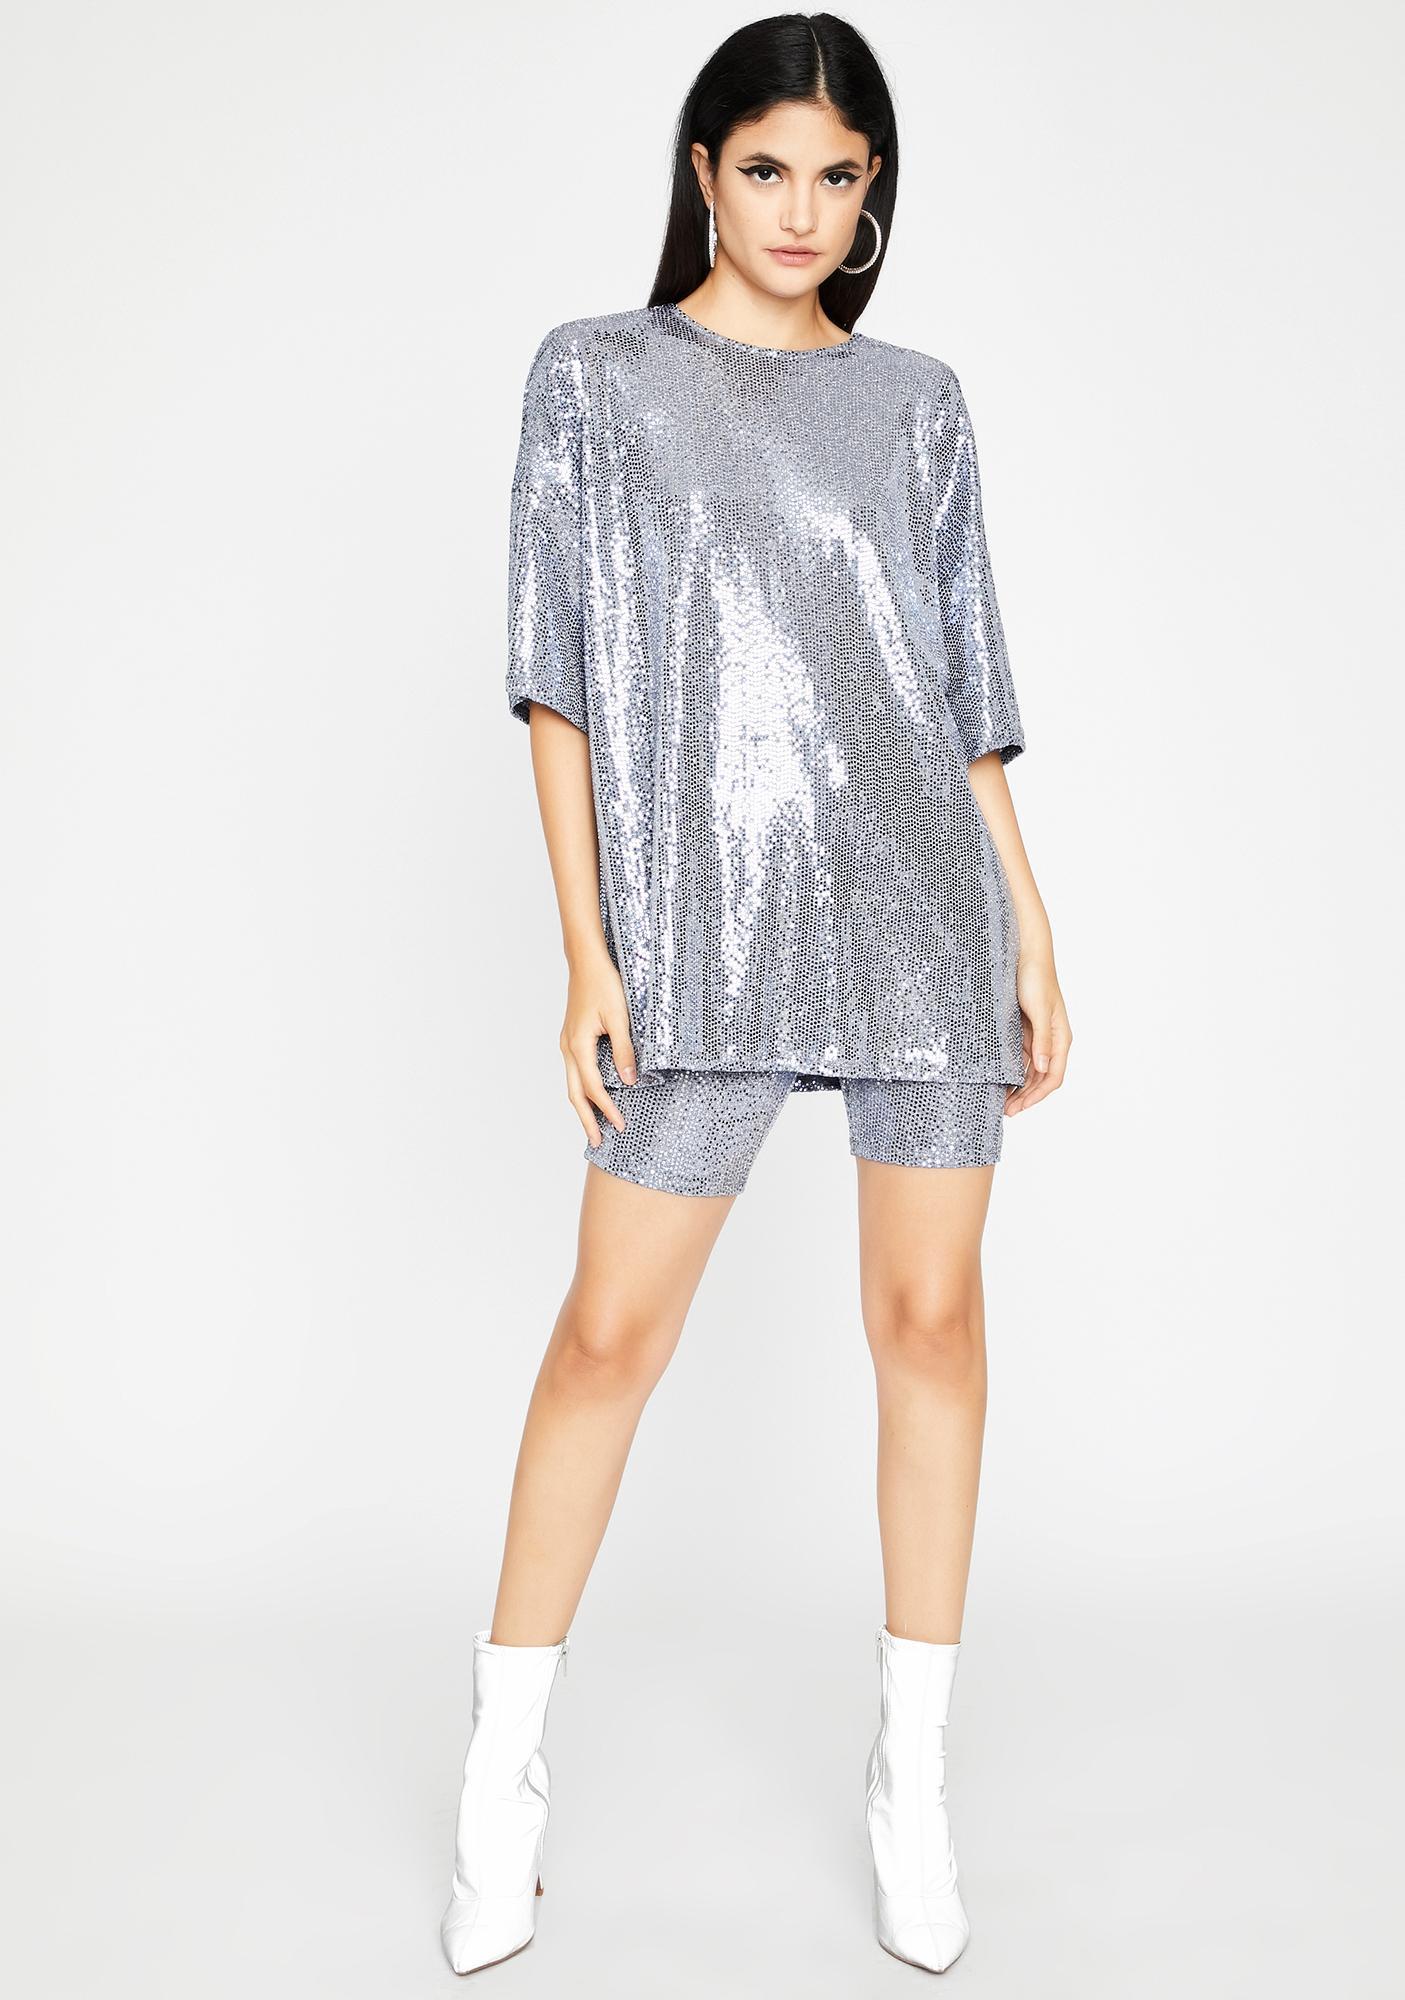 Chill Shiny Stuntin' Sequin Short Set